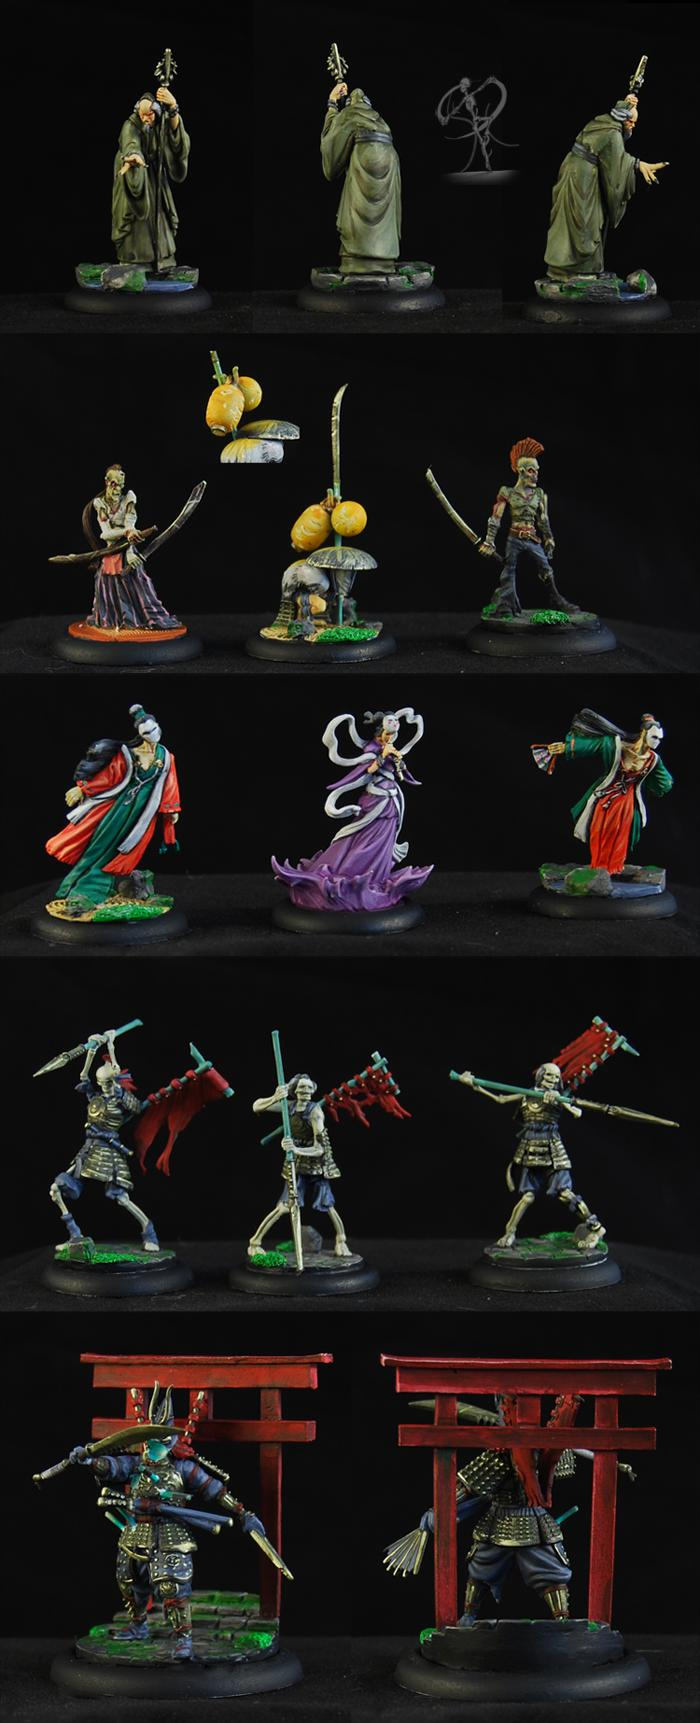 Malifaux, Resurrectionists, Ten Thunders, Wyrd, Yan Lo